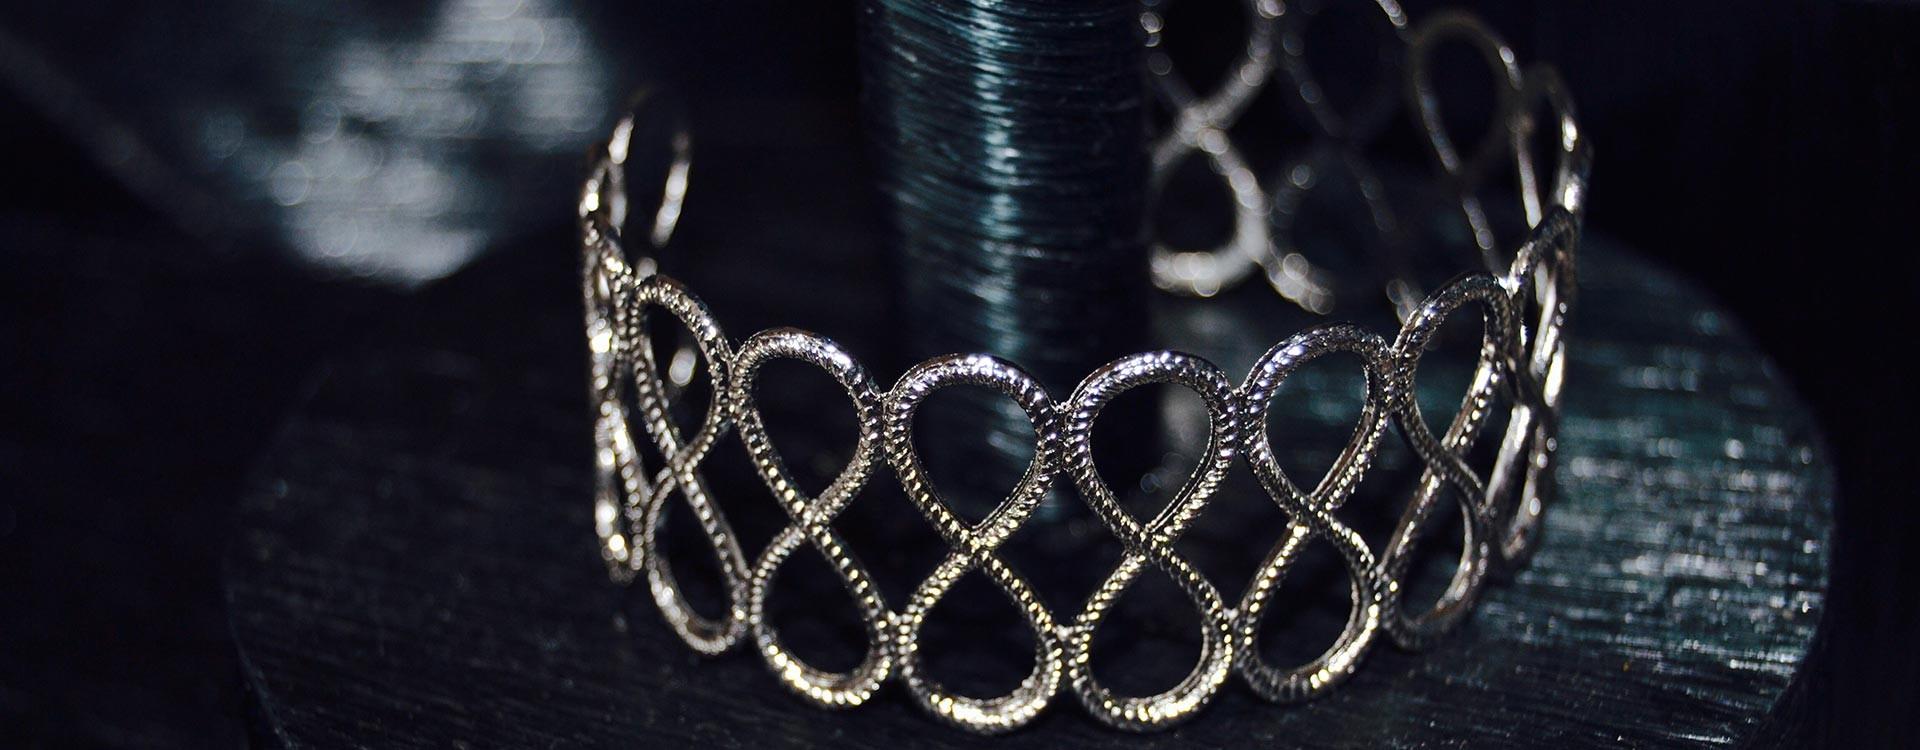 Silvery eternity bracelet